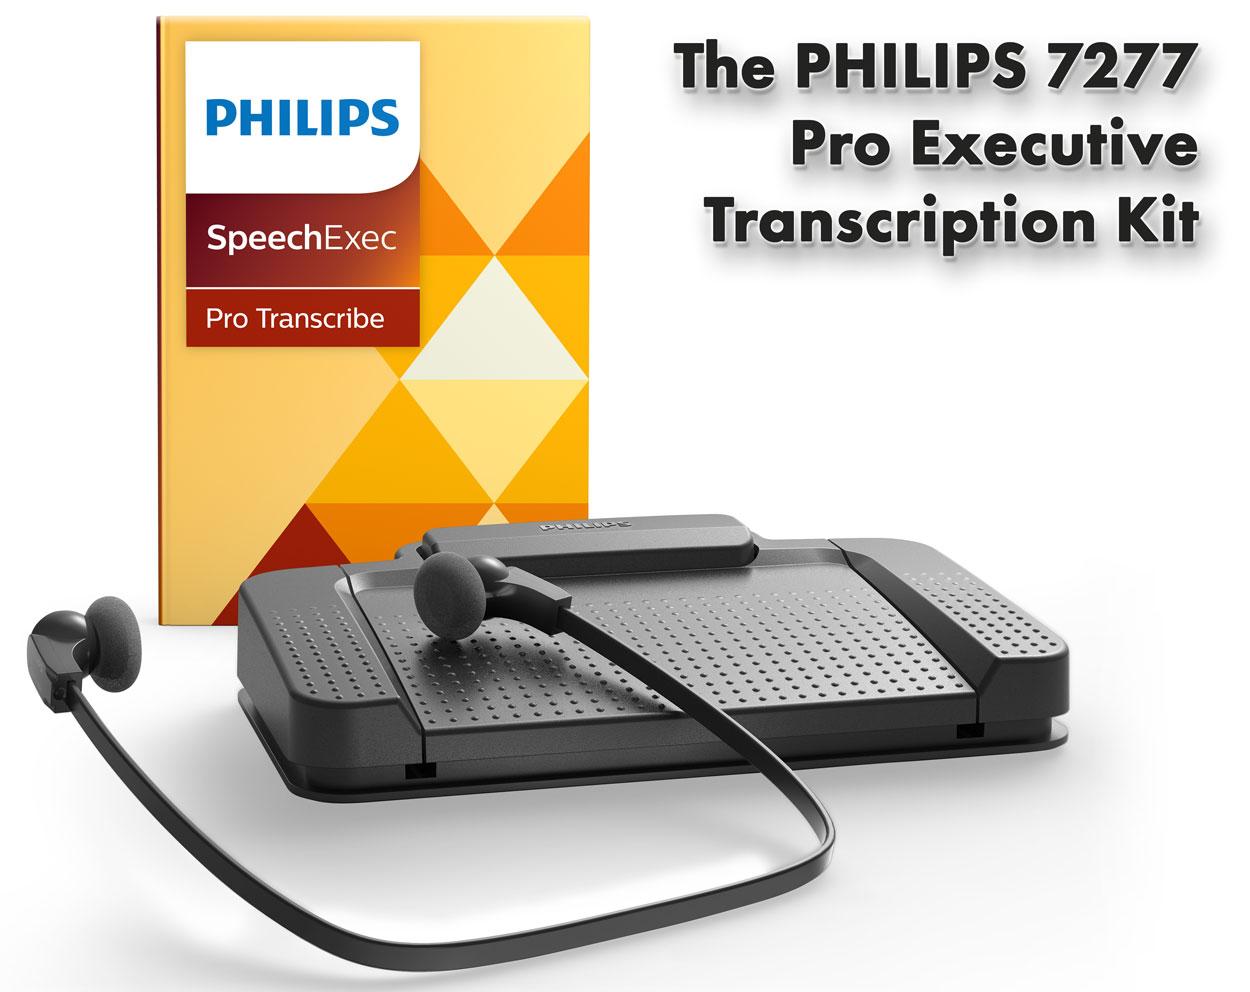 speechexec pro transcription set 7277 philips lfh7277. Black Bedroom Furniture Sets. Home Design Ideas